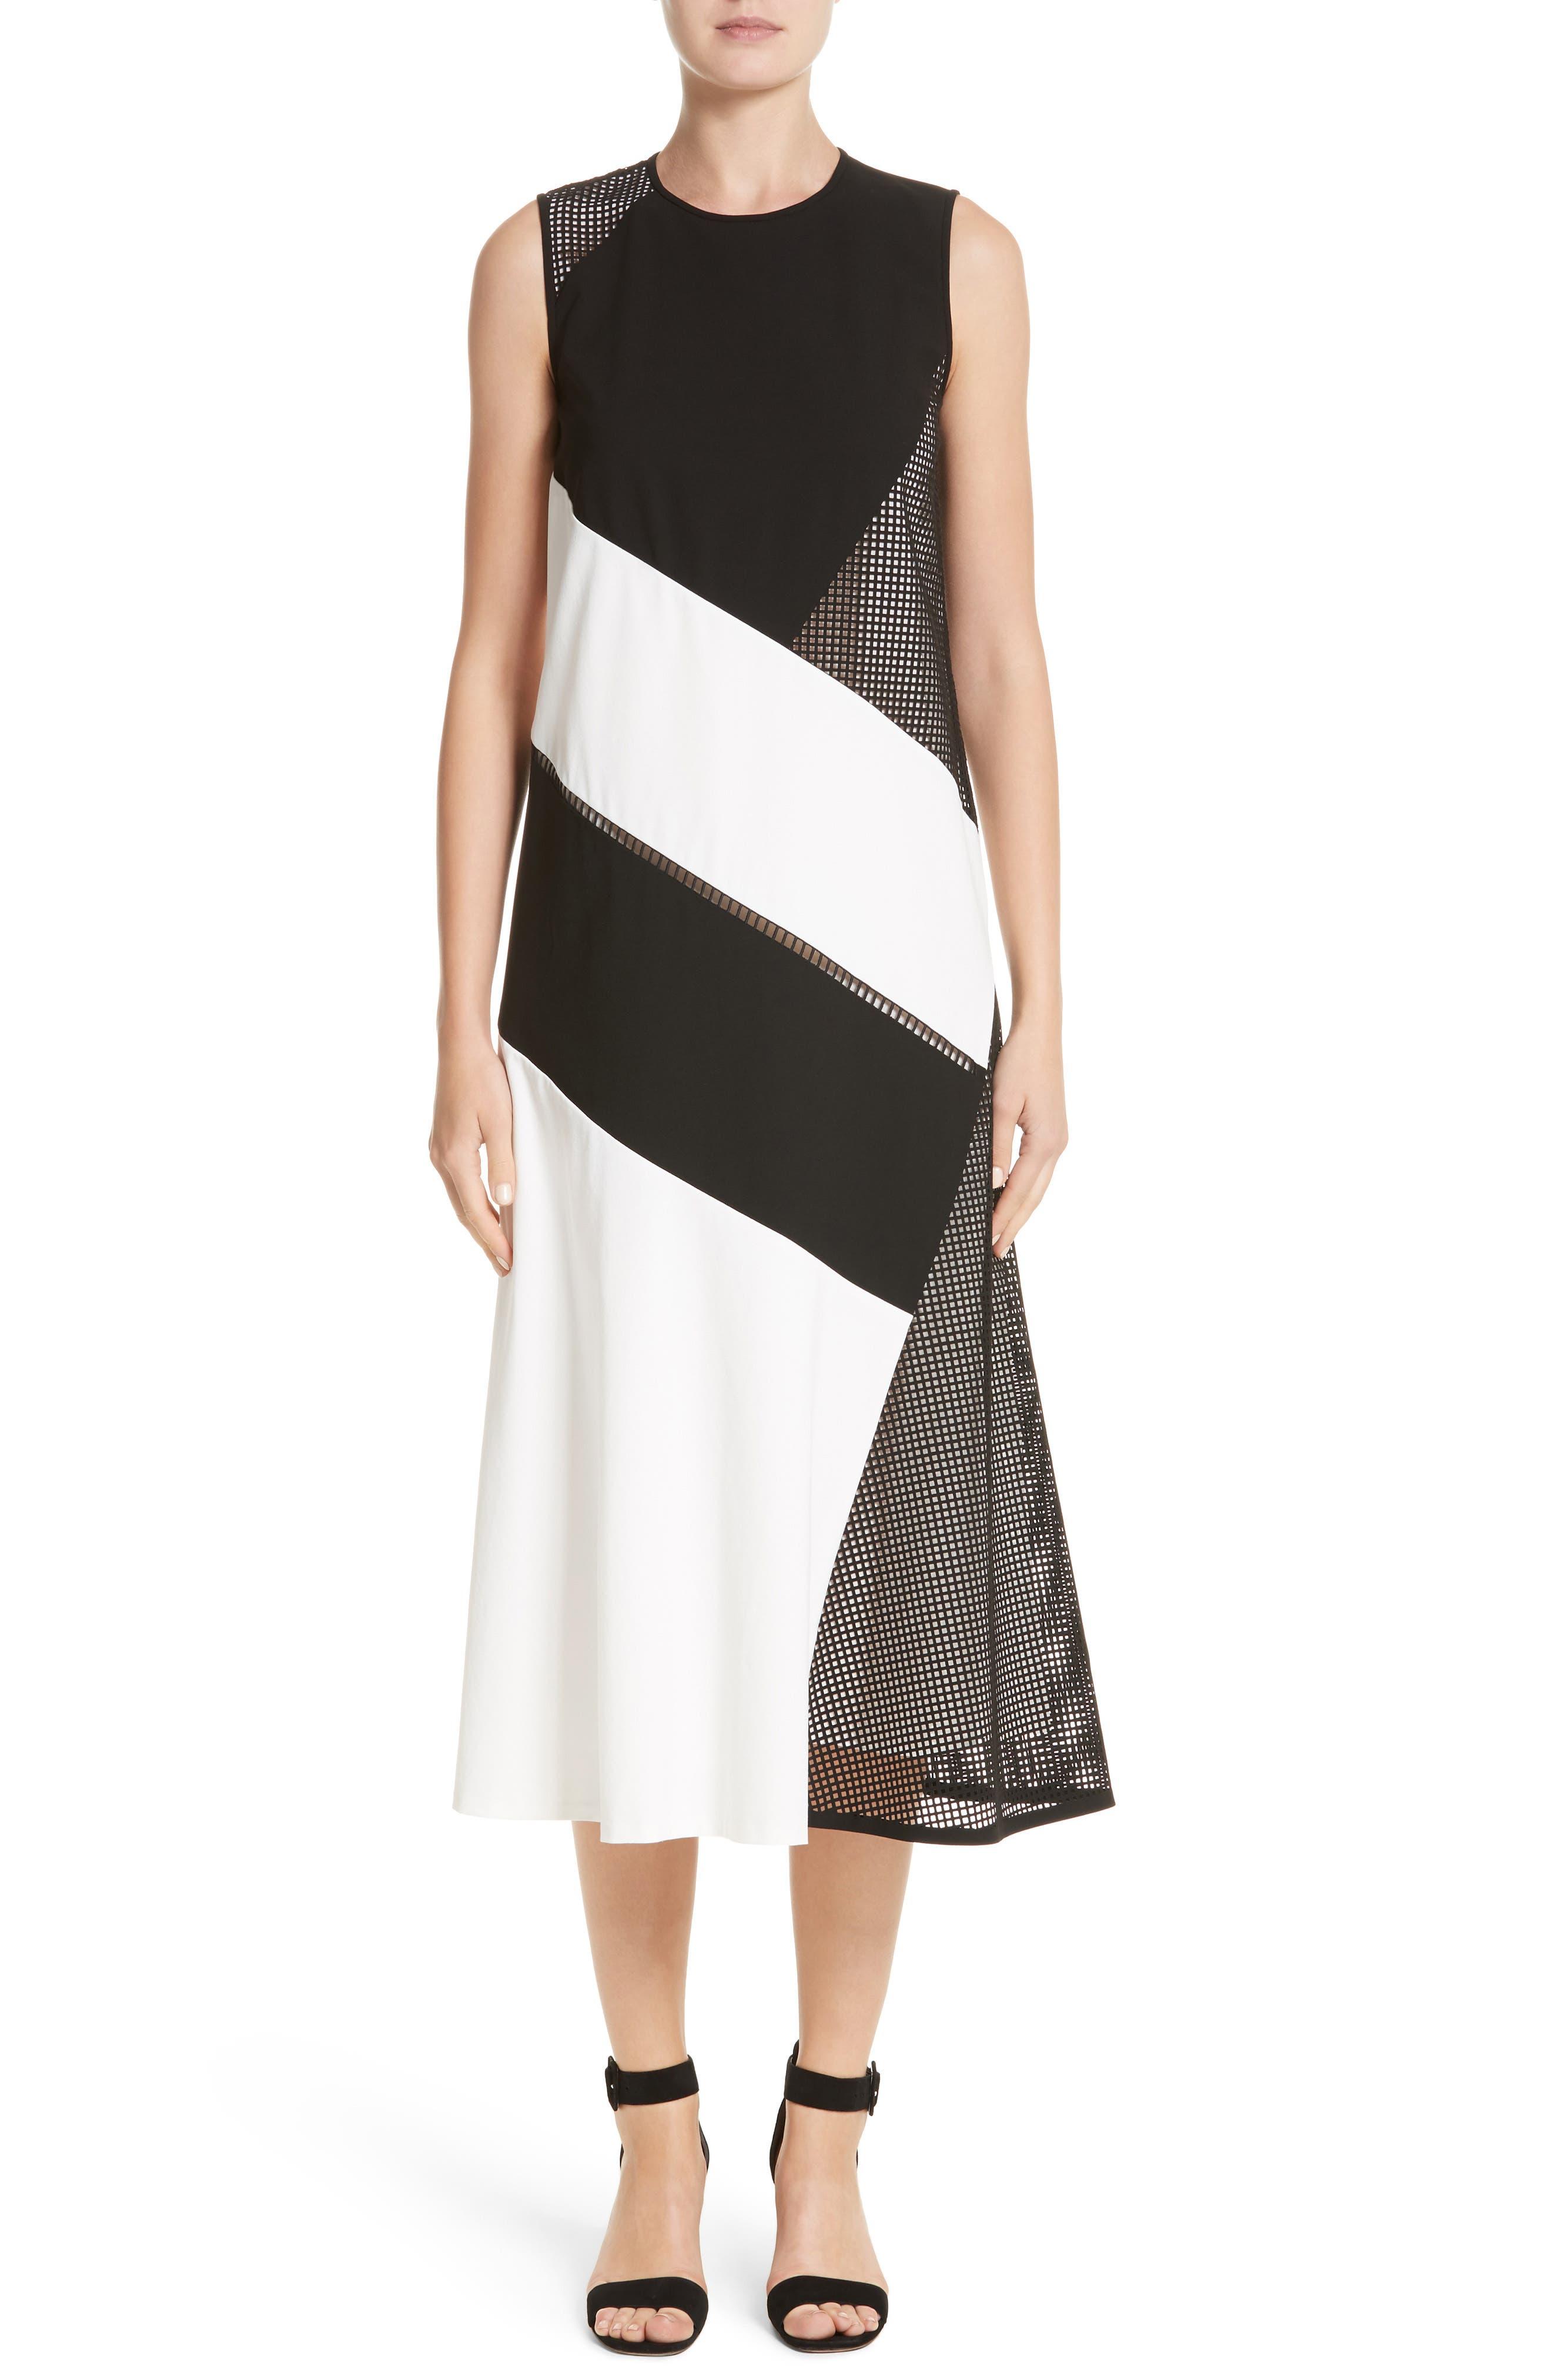 Alternate Image 1 Selected - Lafayette 148 New York Nuri Laser Cut Midi Dress